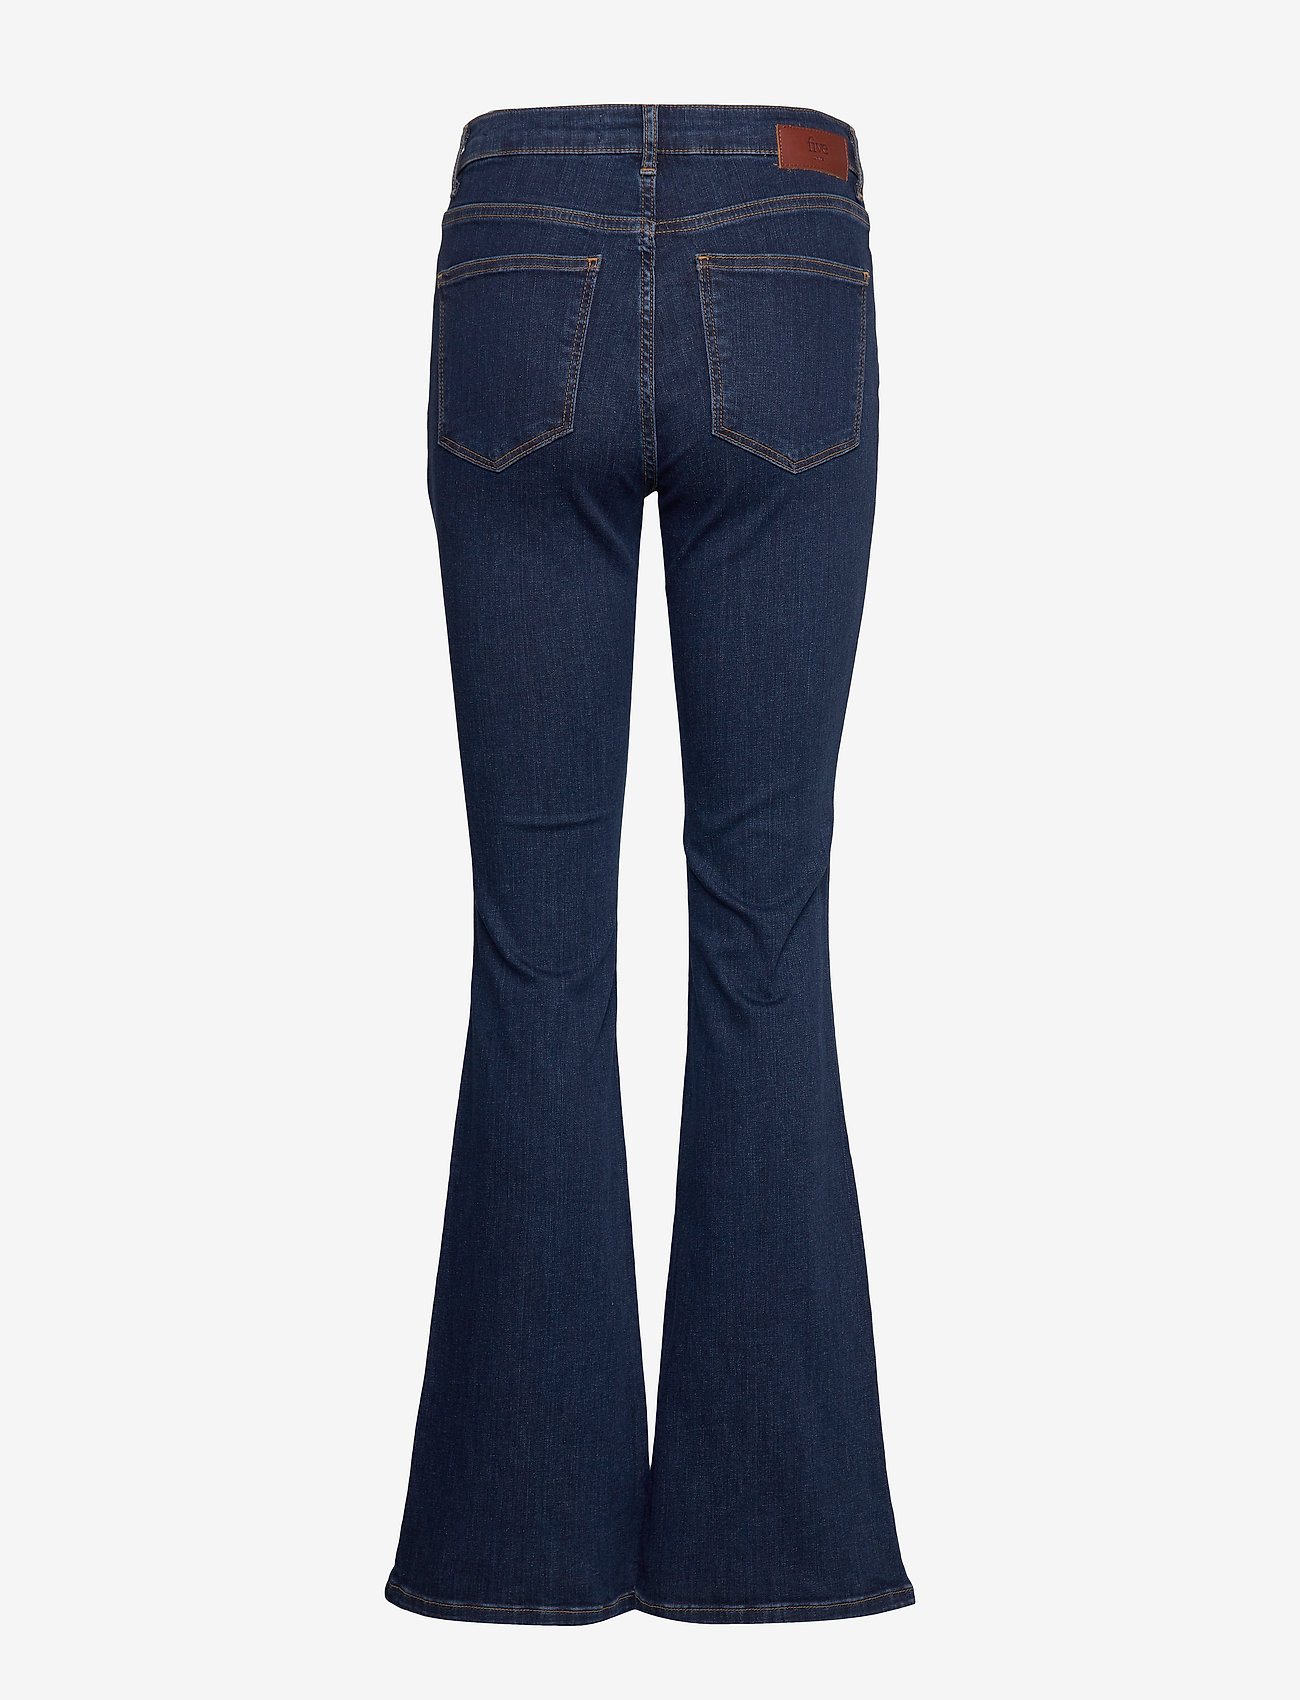 FIVEUNITS - Naomi 595 - utsvängda jeans - dark recycled - 1